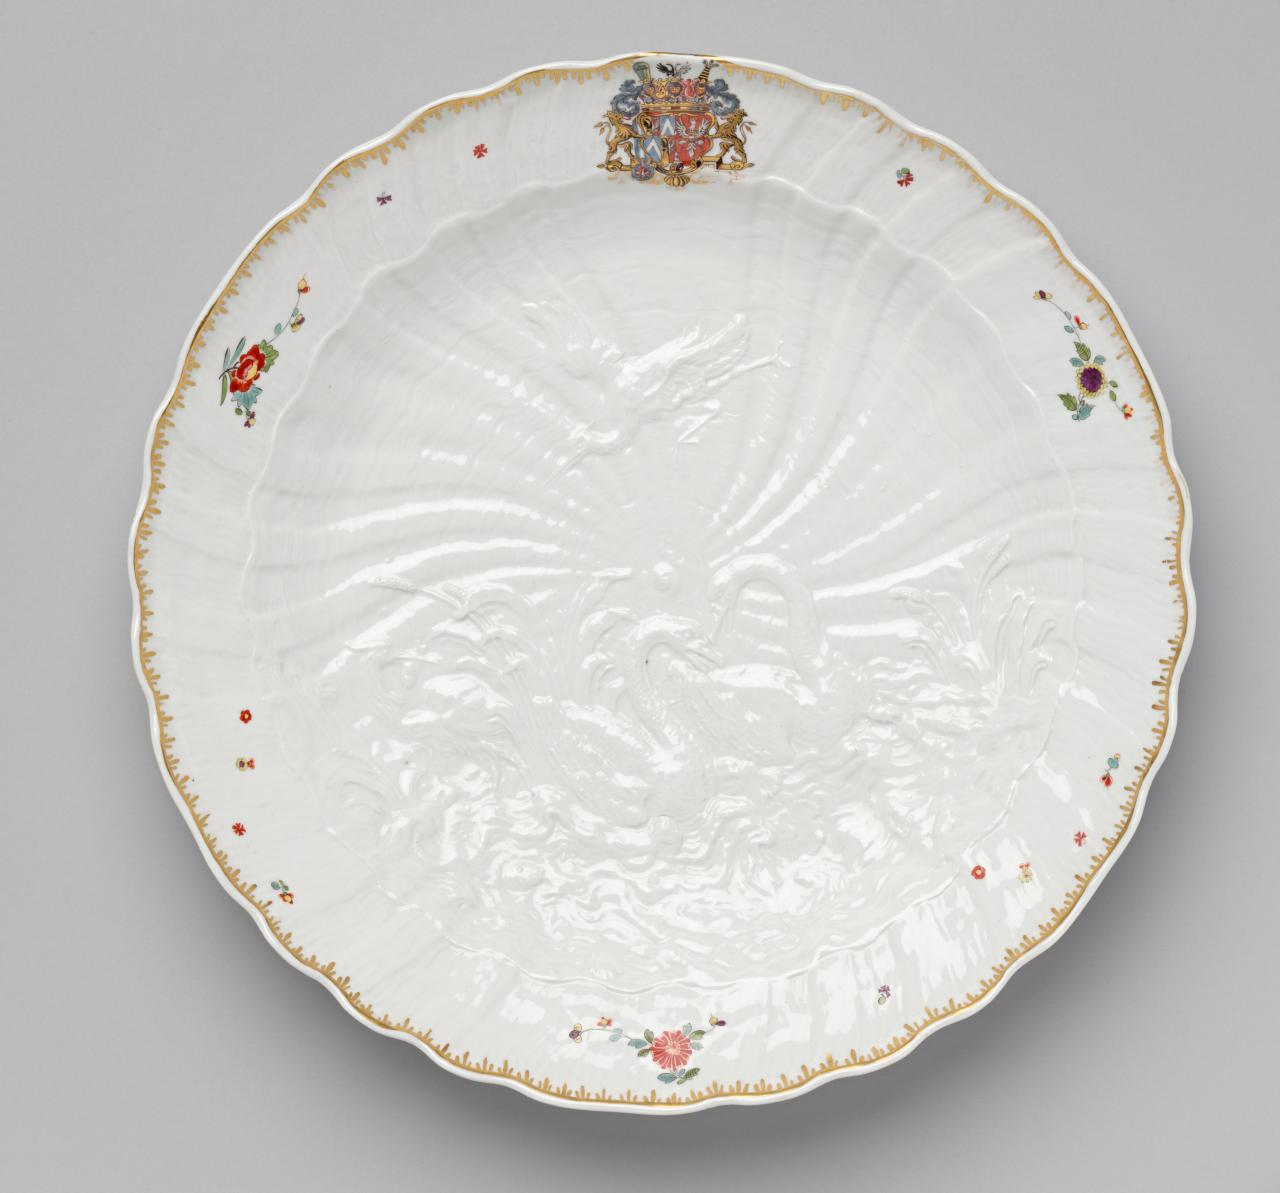 Dish from the Swan service  MEISSEN PORCELAIN FACTORY, Meissen